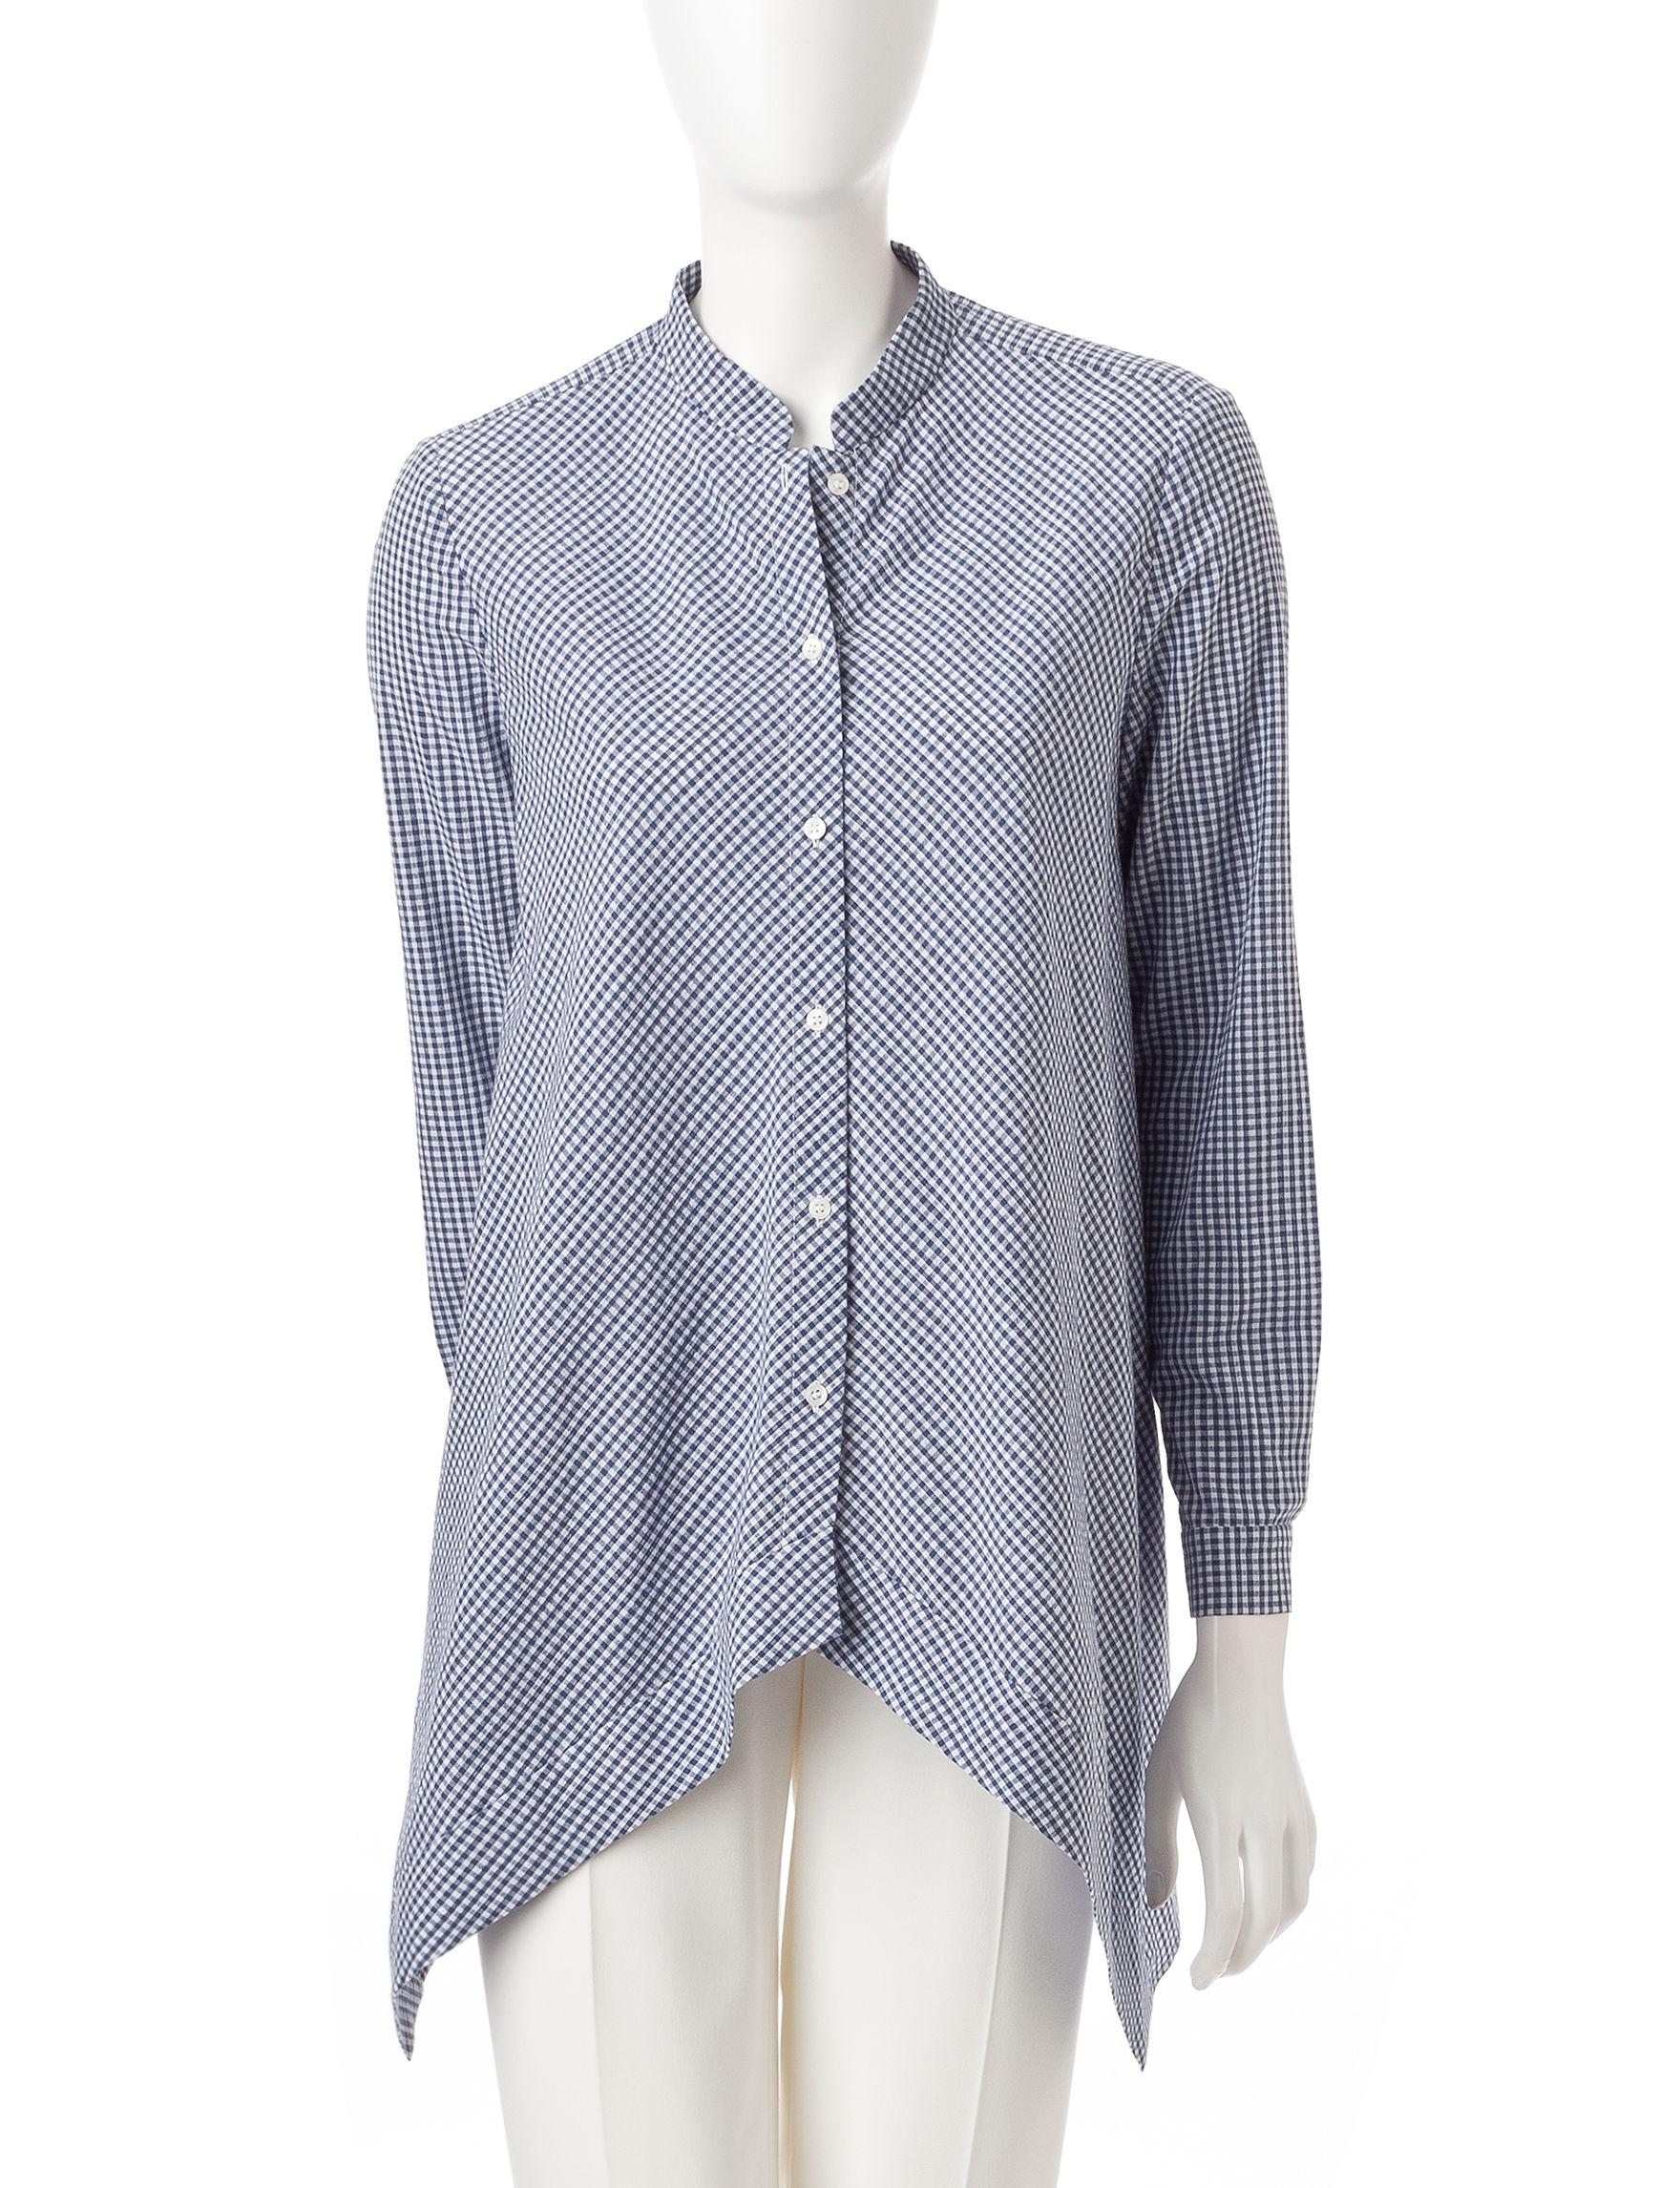 Anne Klein Blue / White Shirts & Blouses